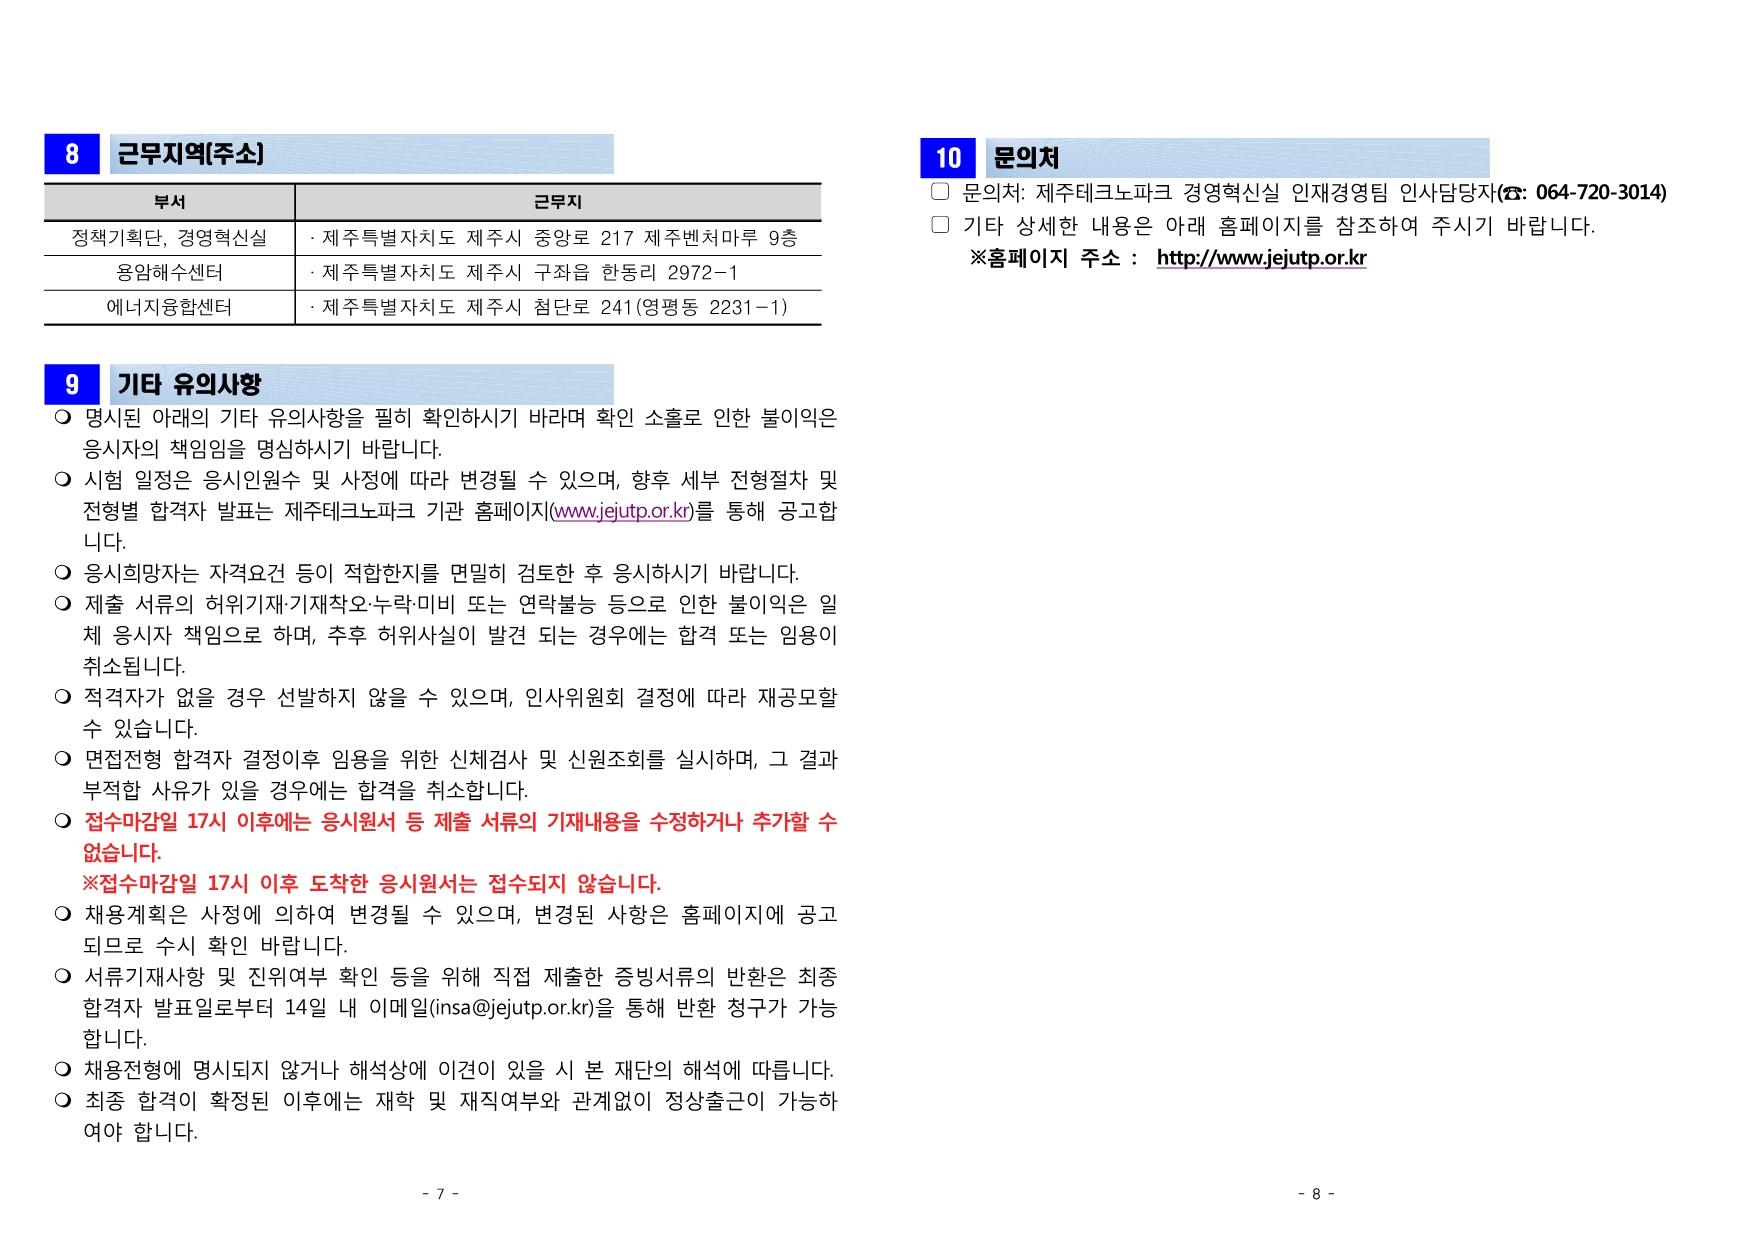 16ef9f2f-1ba0-43d6-a45f-f5a831c0d54d.pdf-0004.jpg